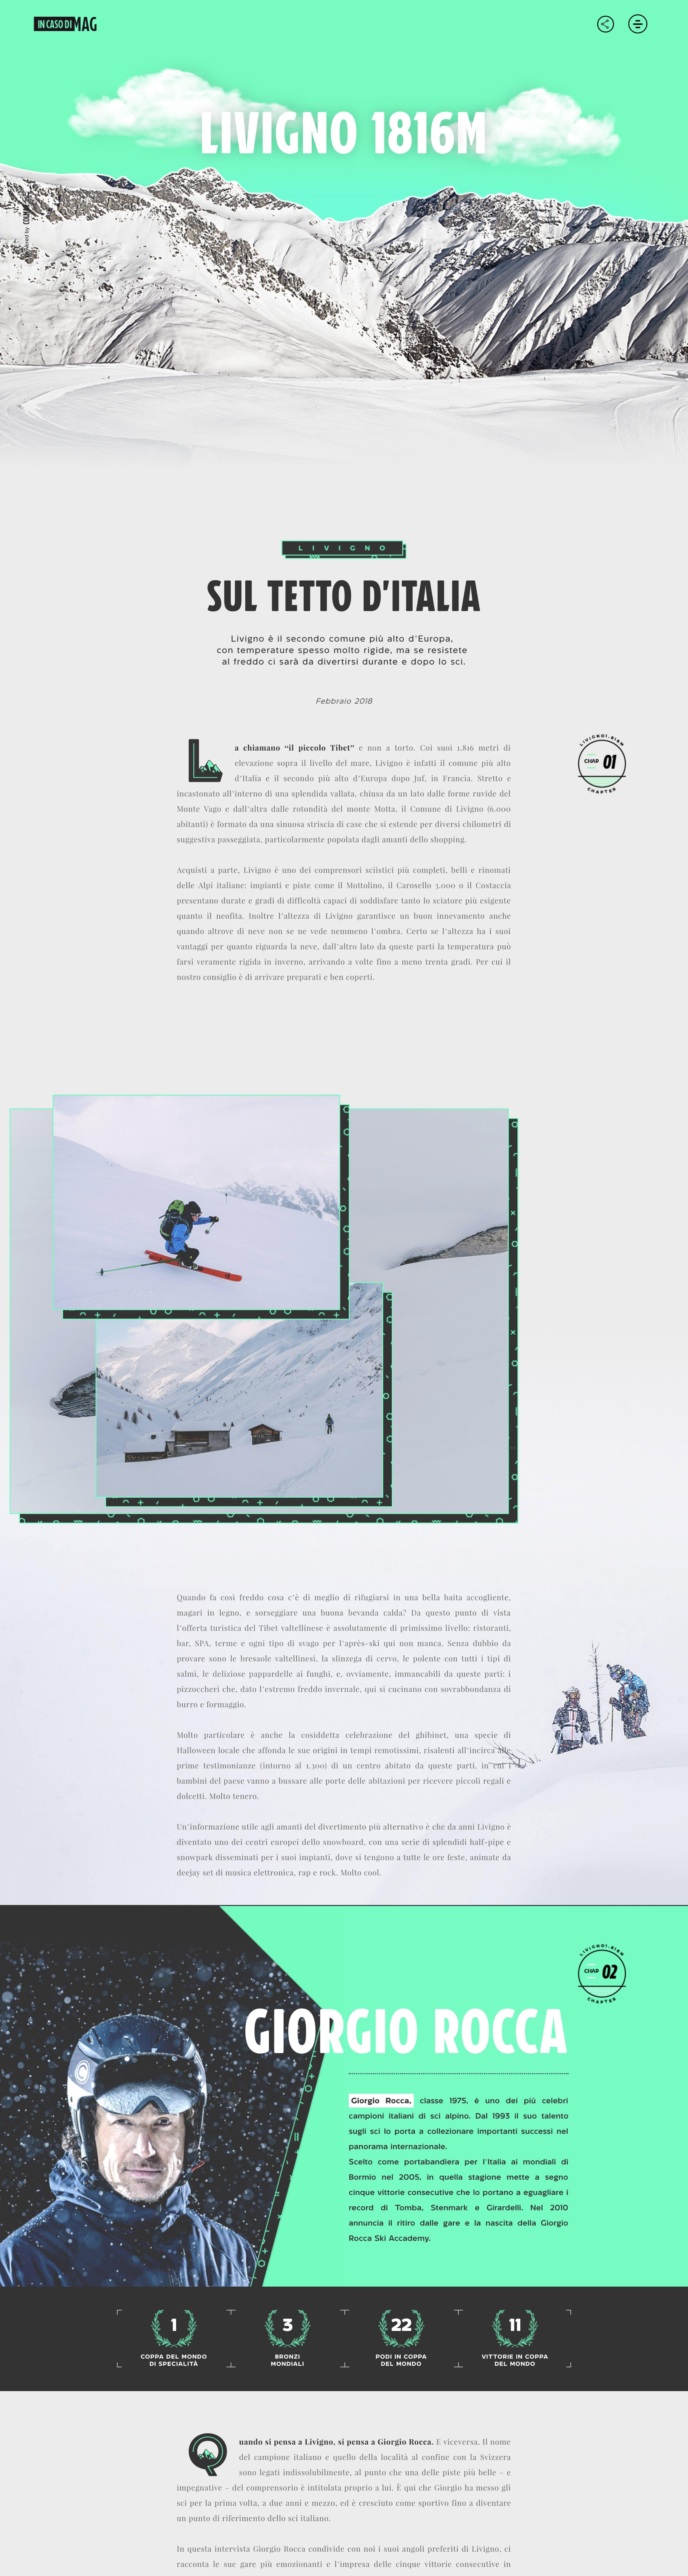 Livigno – In caso di MAG Website Screenshot